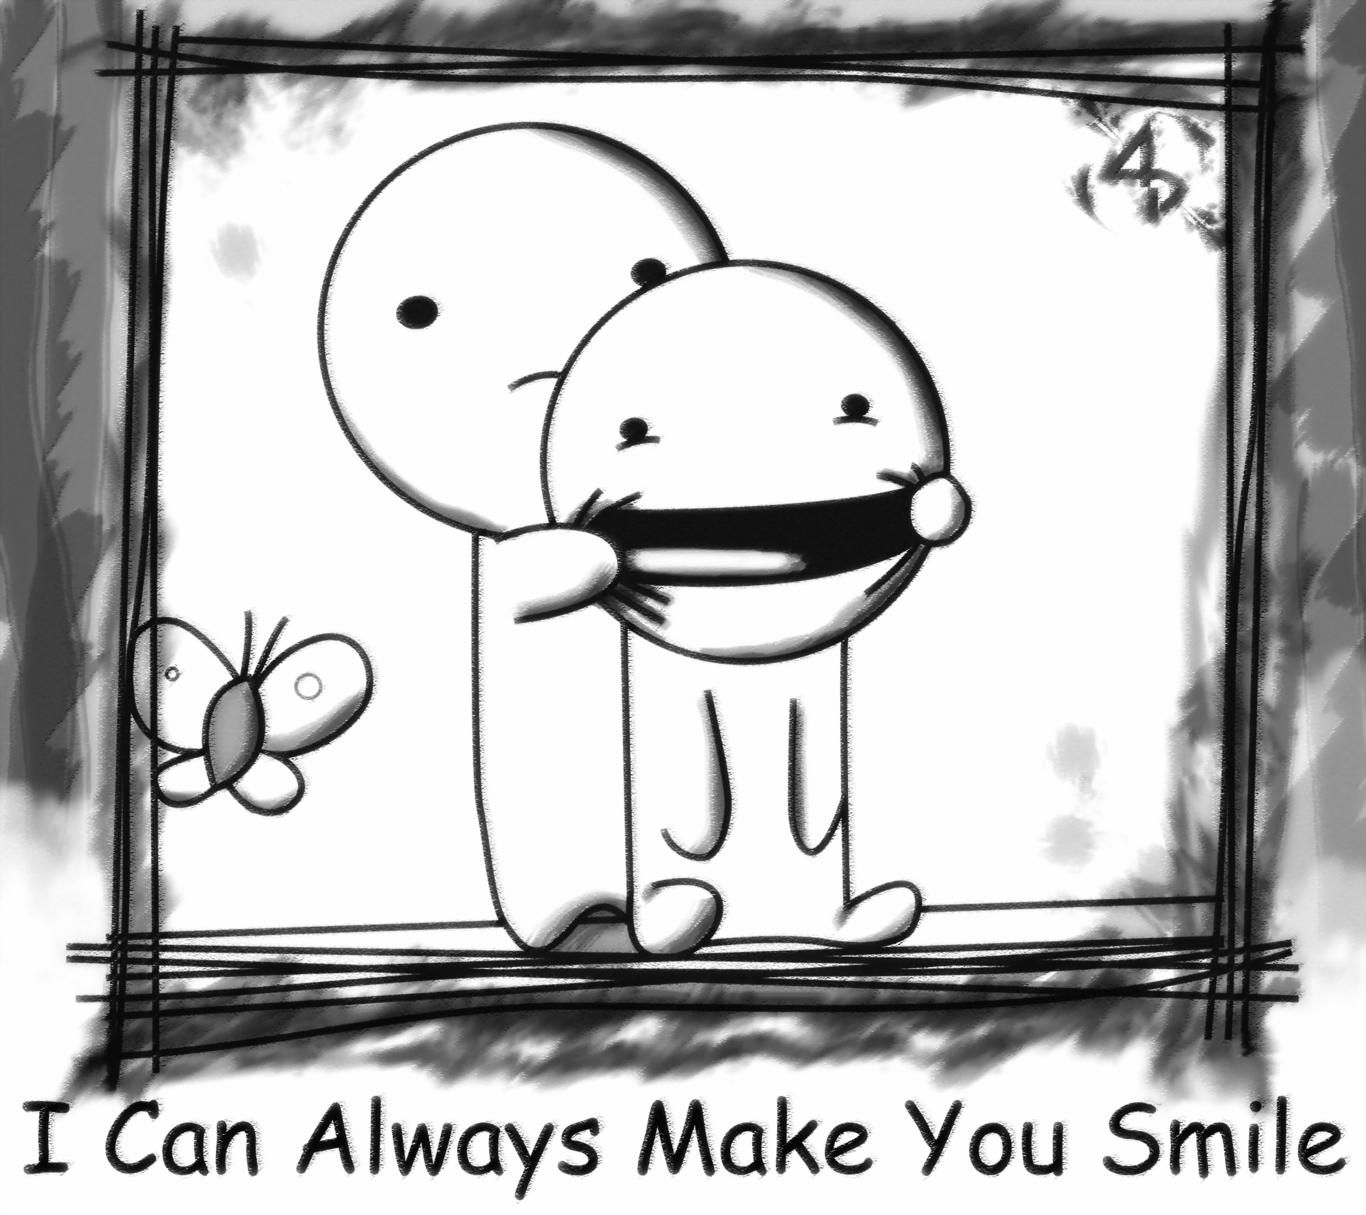 U Make Me Smile Quotes: Serene Satire